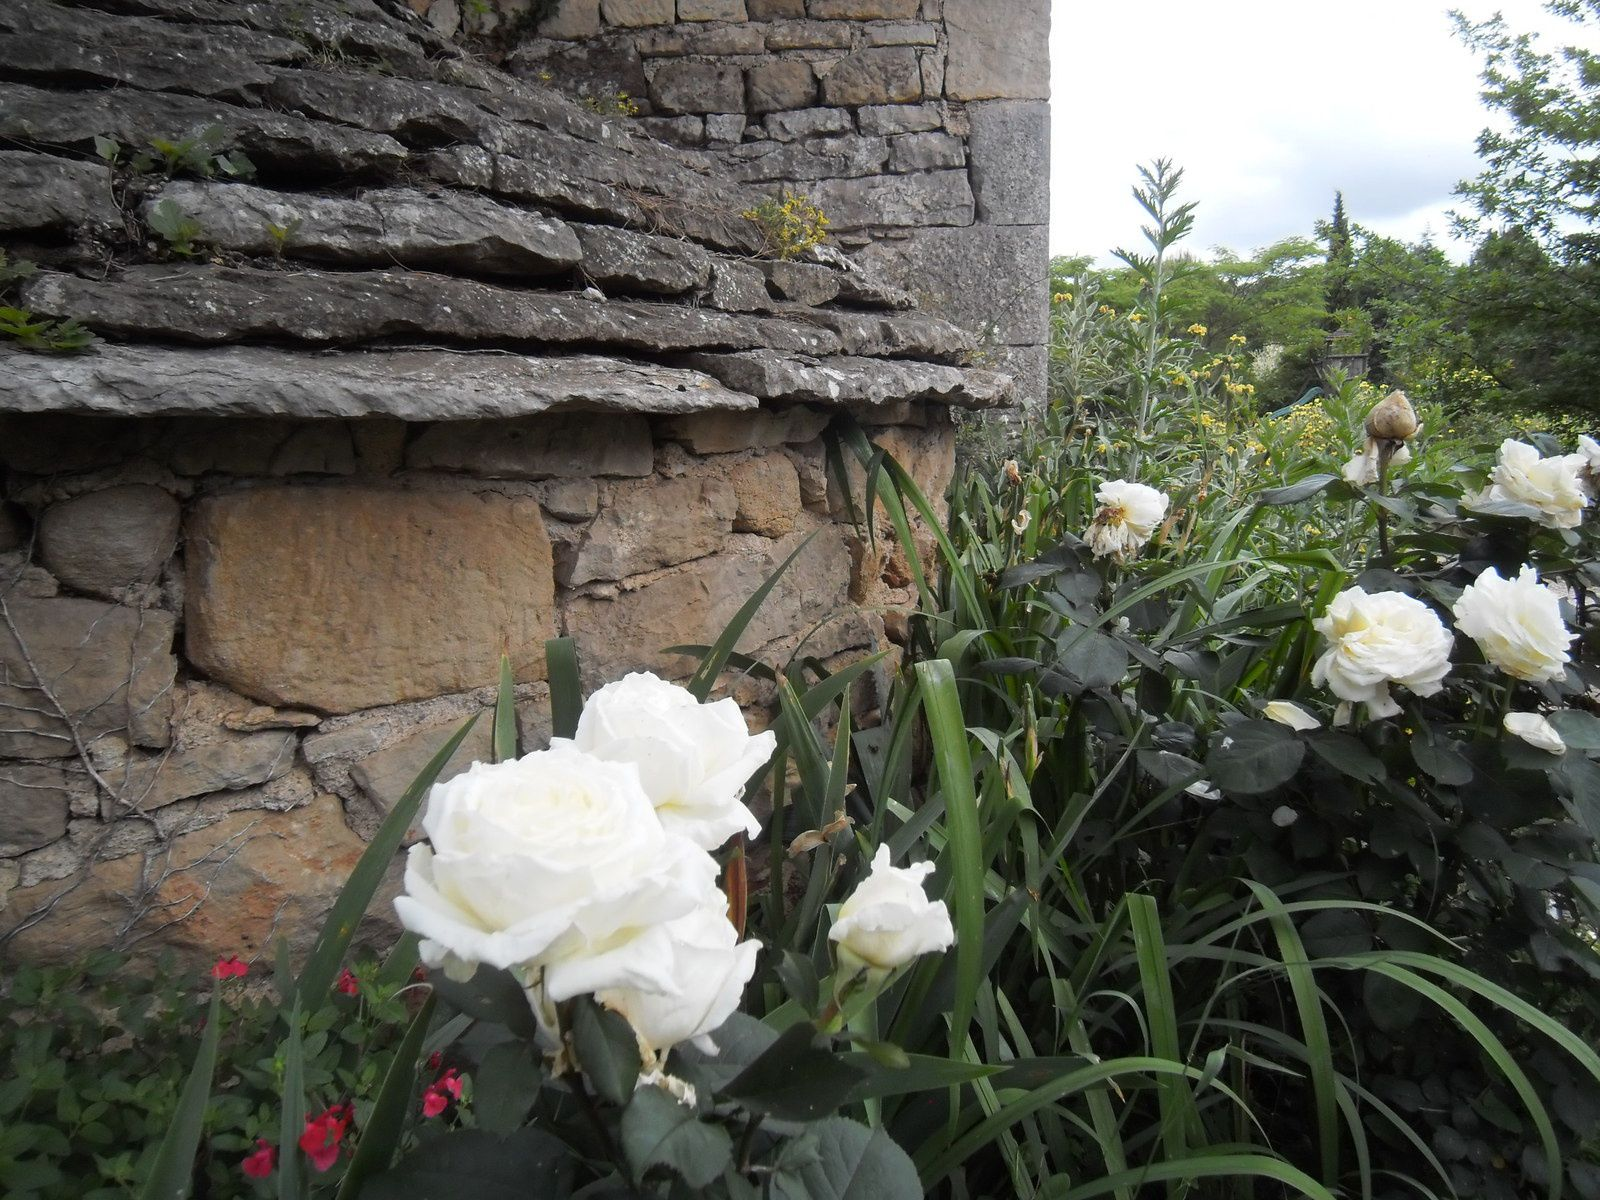 Roses 'Jeanne Moreau'